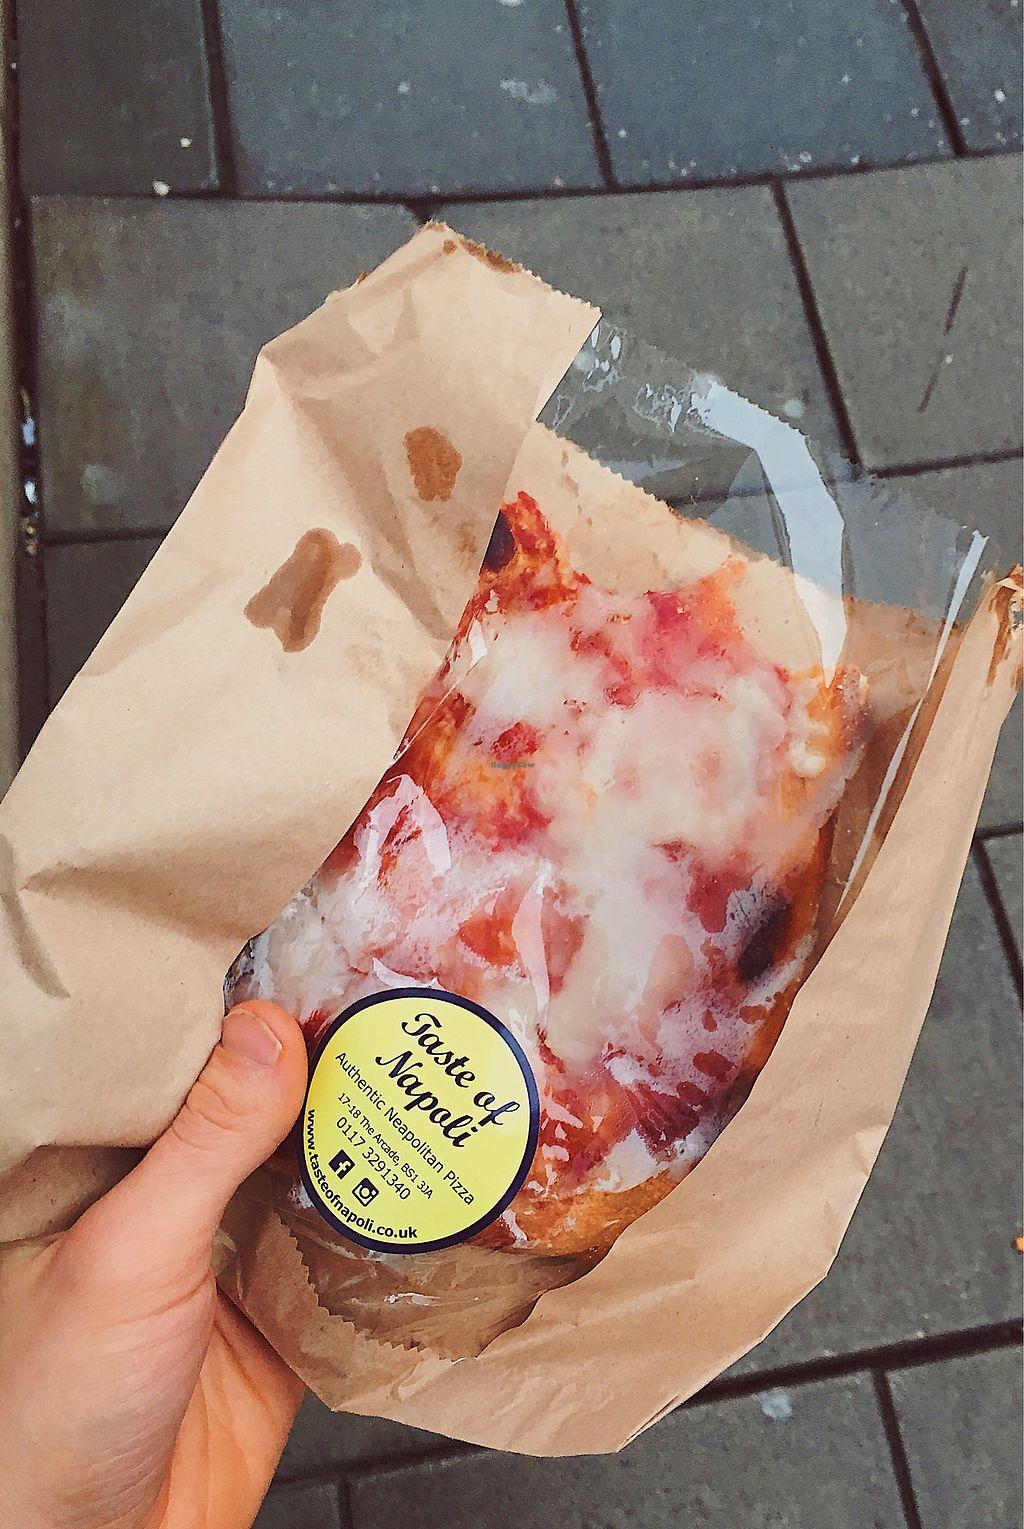 "Photo of Taste of Napoli  by <a href=""/members/profile/treehousecanoe"">treehousecanoe</a> <br/>Pizza al taglio  <br/> January 4, 2018  - <a href='/contact/abuse/image/92357/342869'>Report</a>"